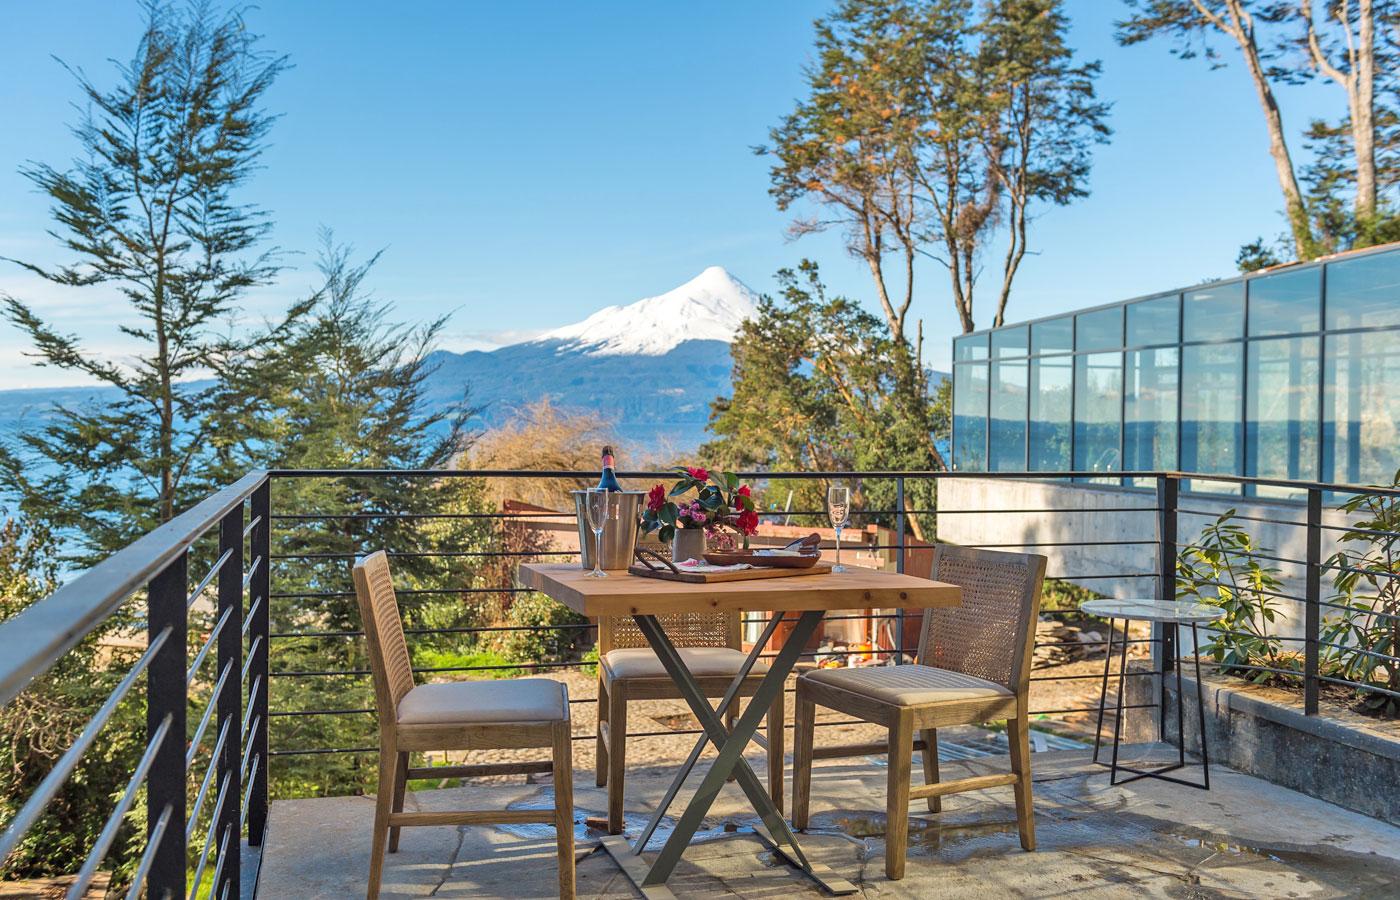 Hotel AWA, Luxury hotel in Puerto Varas, Chile